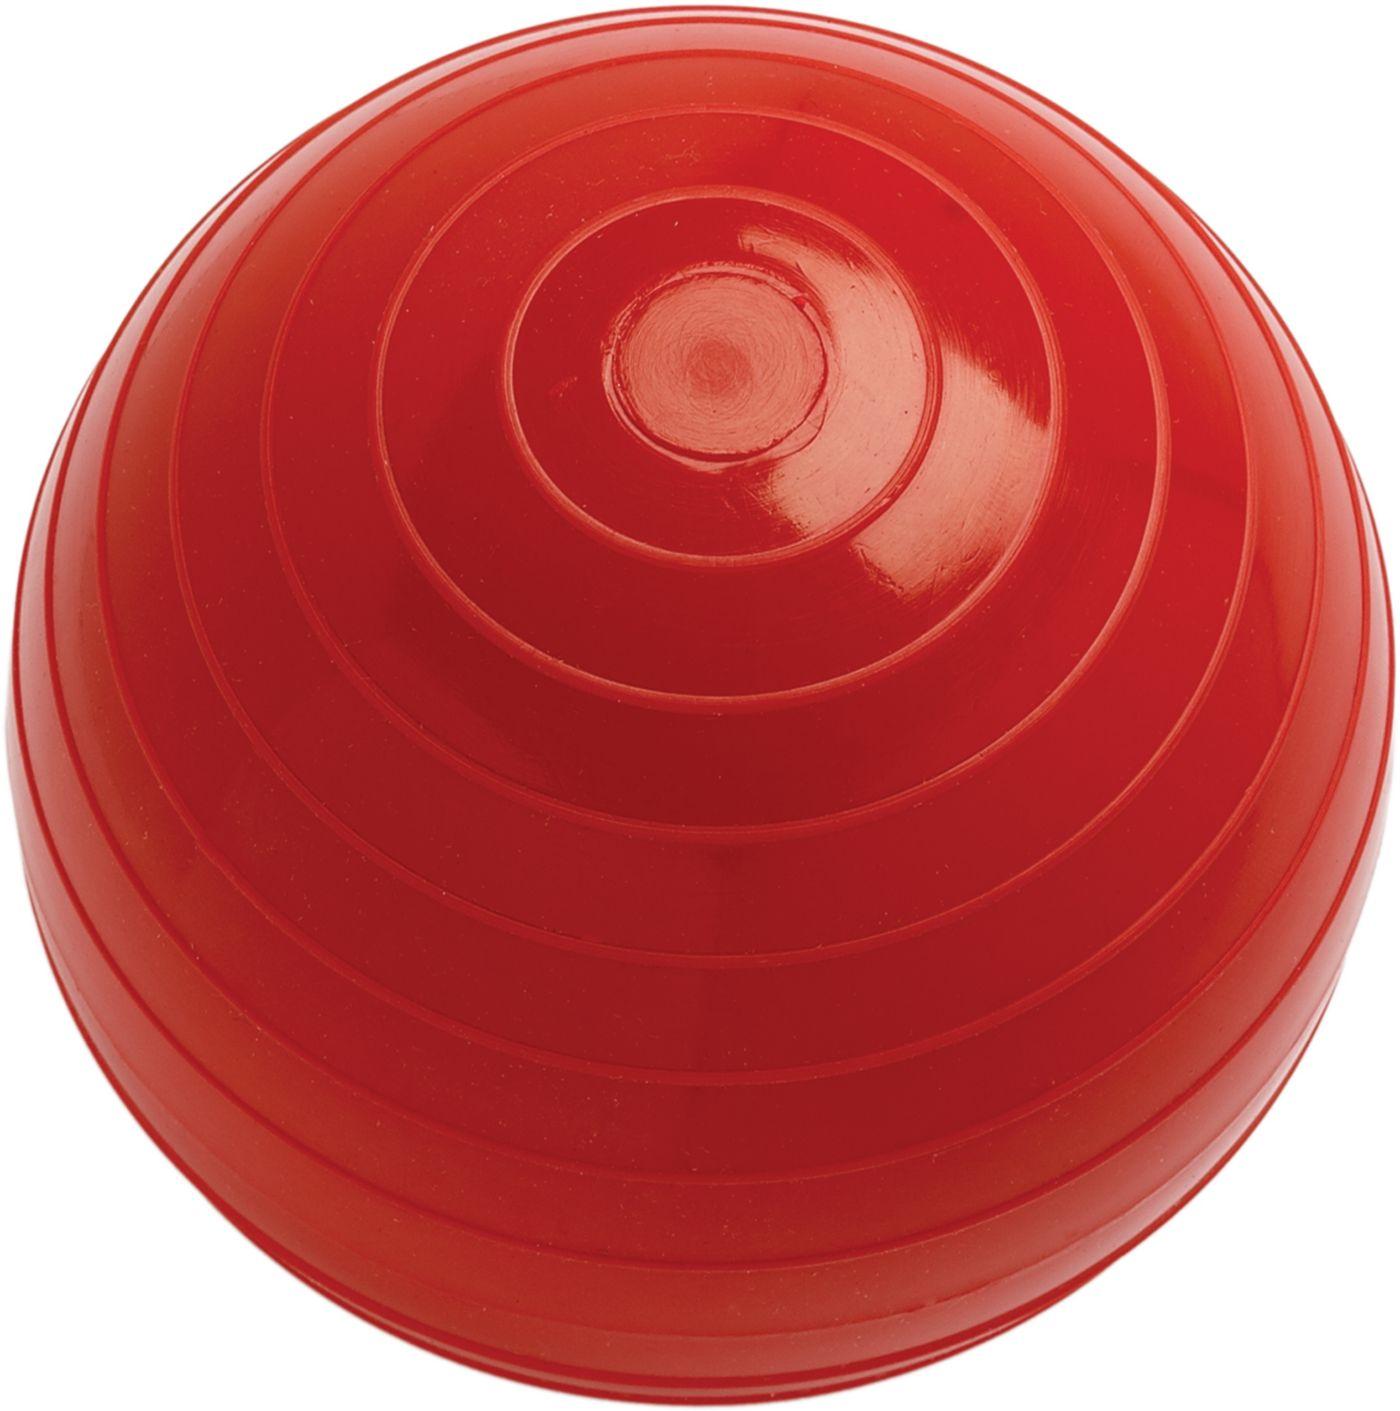 Gill 600 g Indoor Throwing Ball